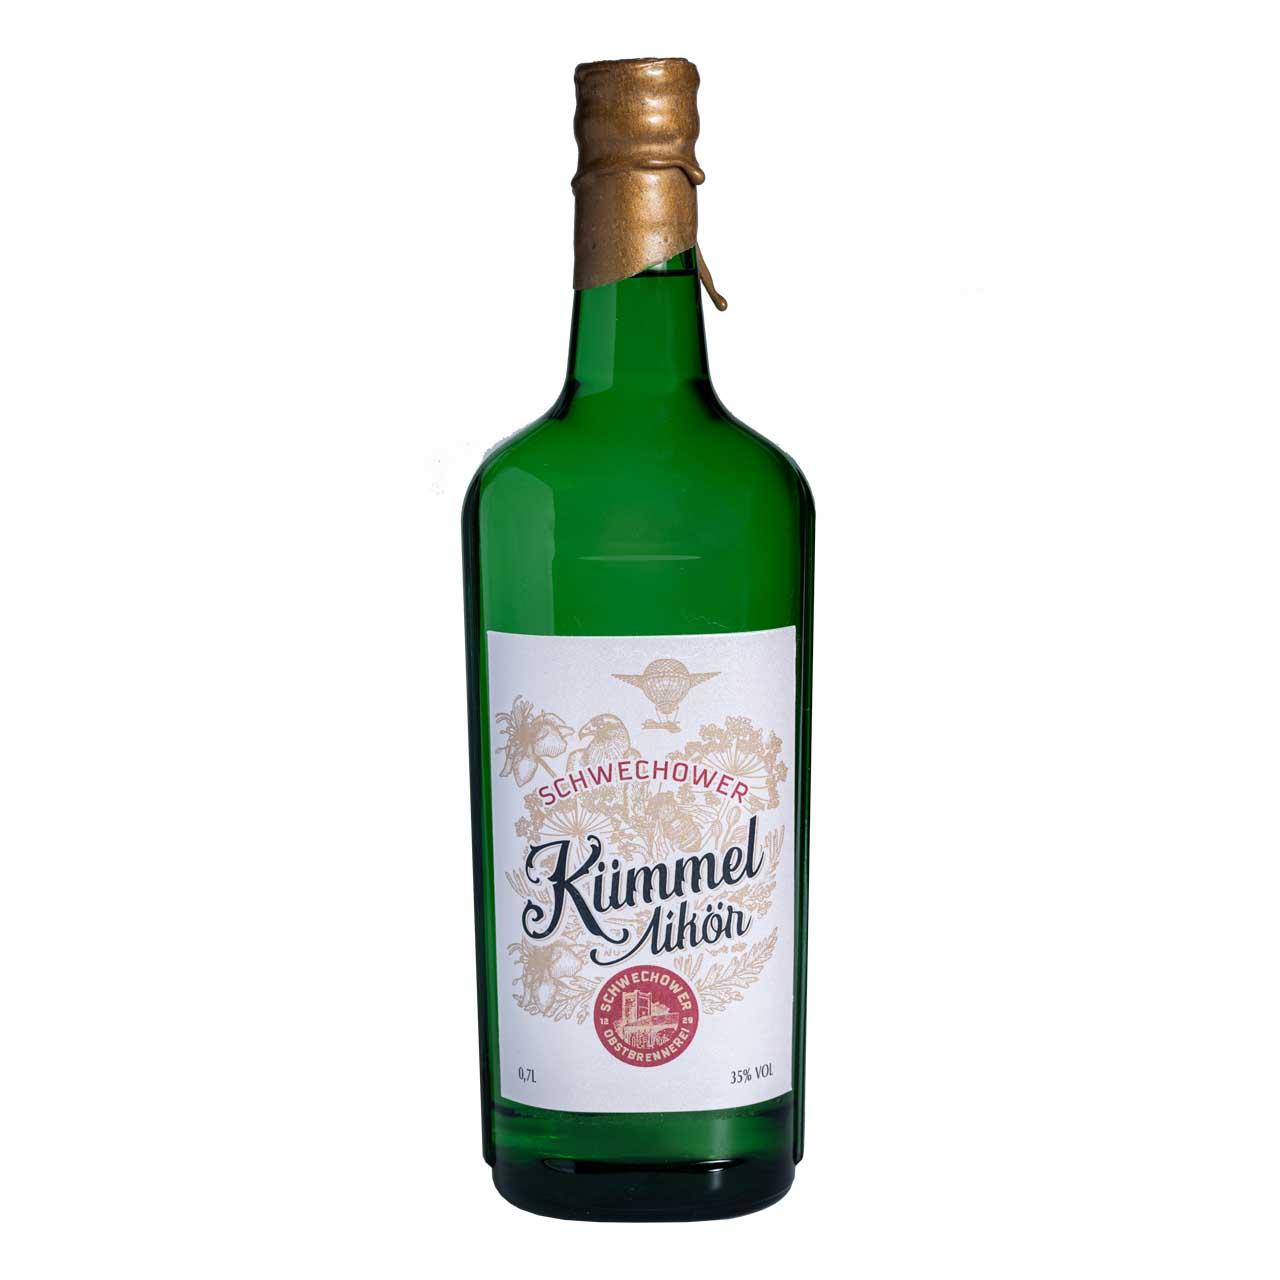 Schwechower-Kummellikor